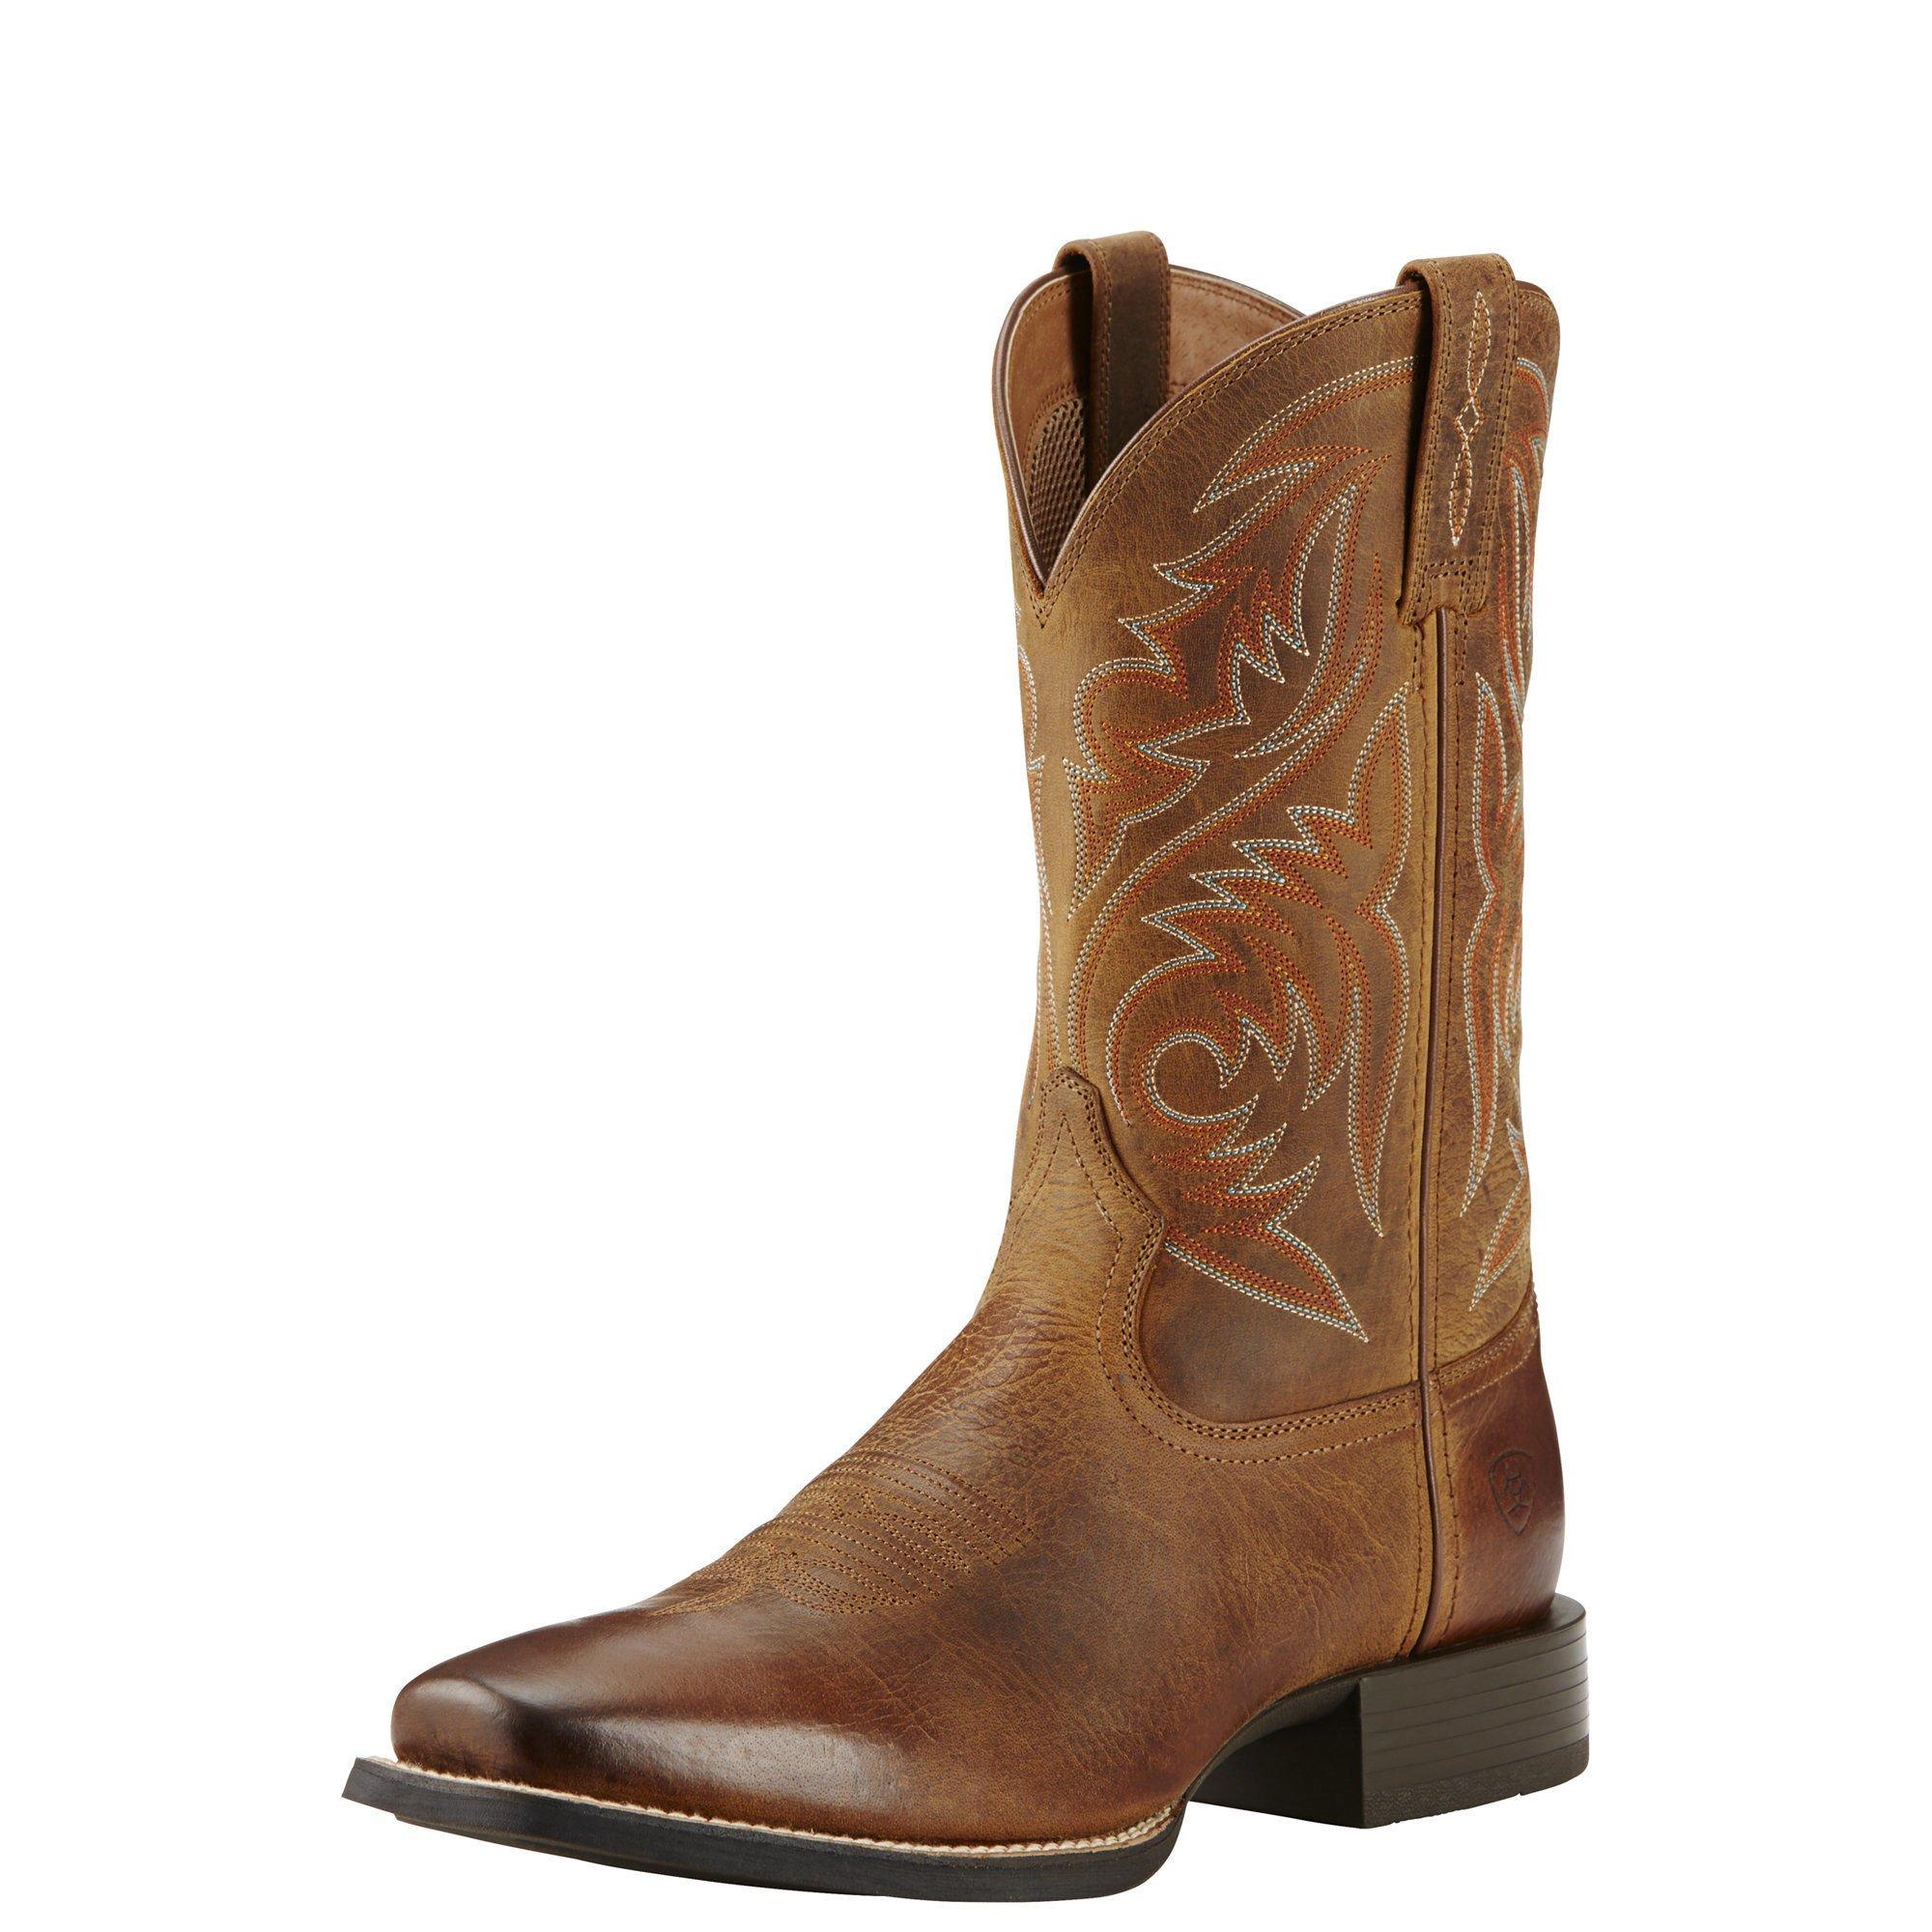 Ariat Men's Sport Herdsman Work Boot, Powder Brown, 10.5 D US